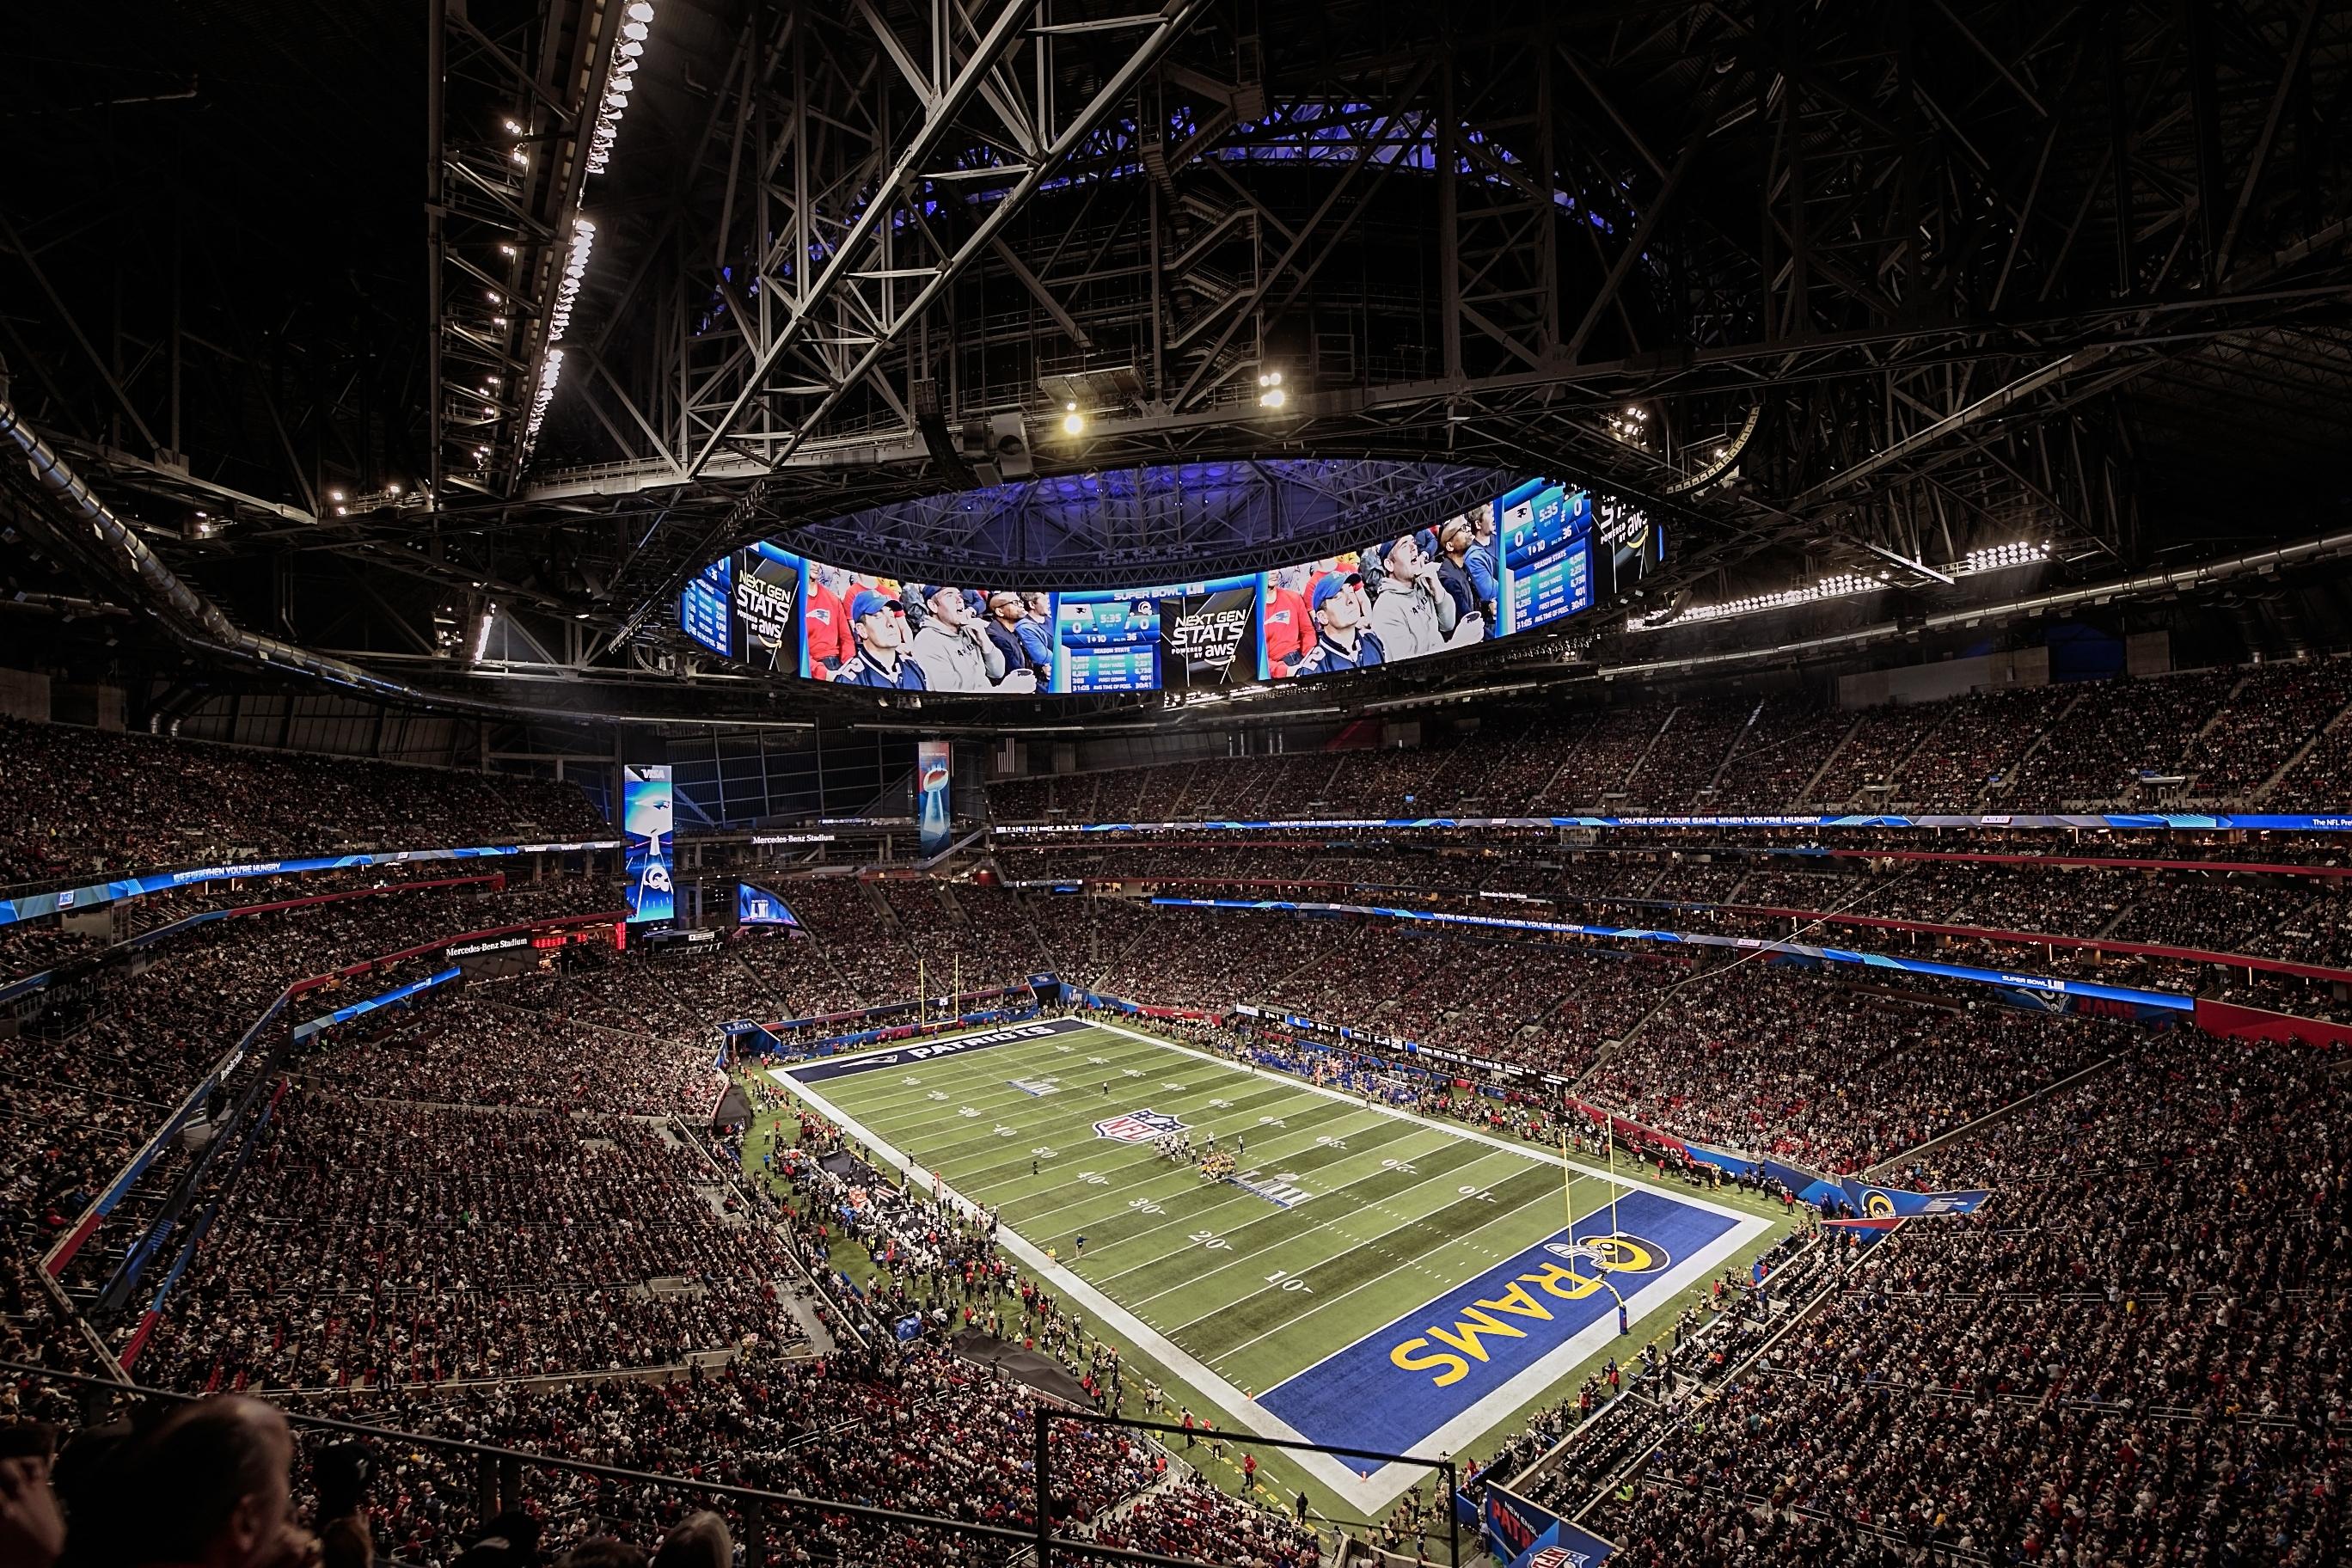 Super Bowl Liii - Mercedes Benz Stadium regarding Mercedes Benz Stadium Super Bowl Map